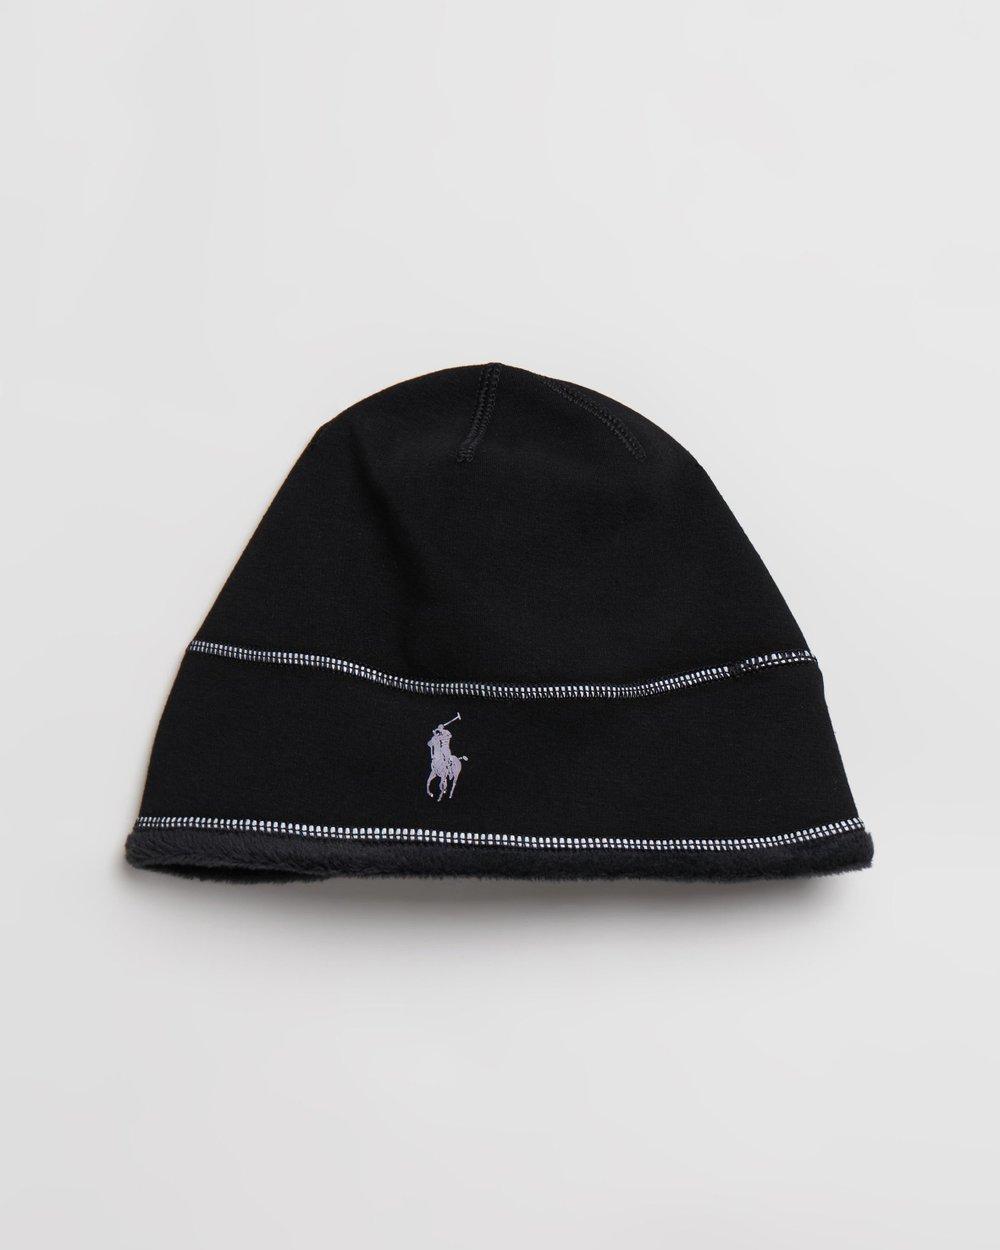 780d1a1dea4 Athleisure Hat by Polo Ralph Lauren Online